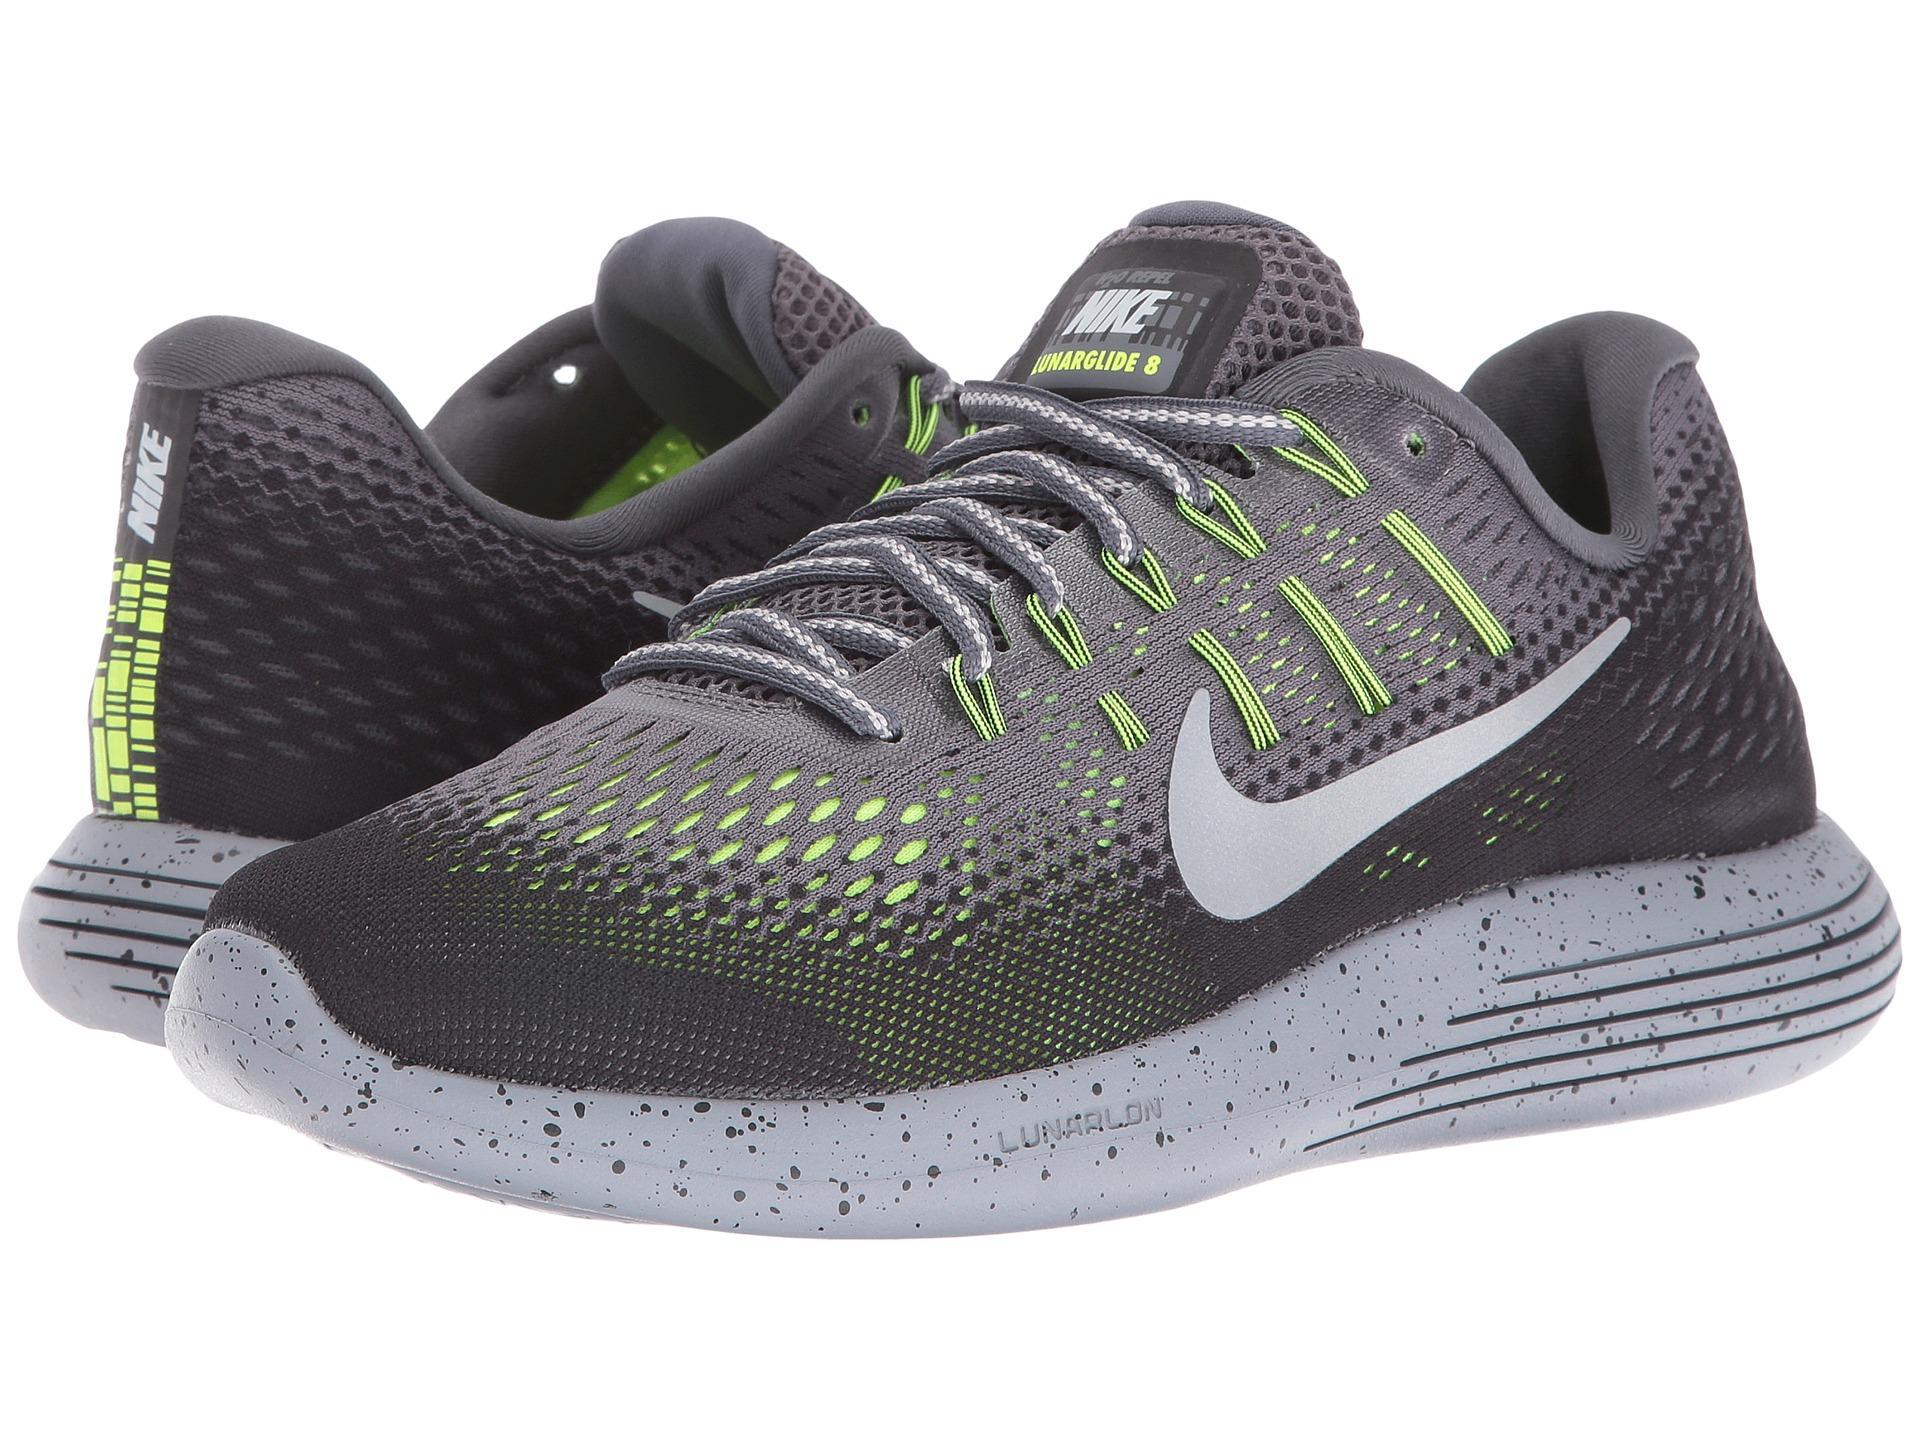 Cheap Nike Lunarglide Femminile Zappos 26293 2bff6